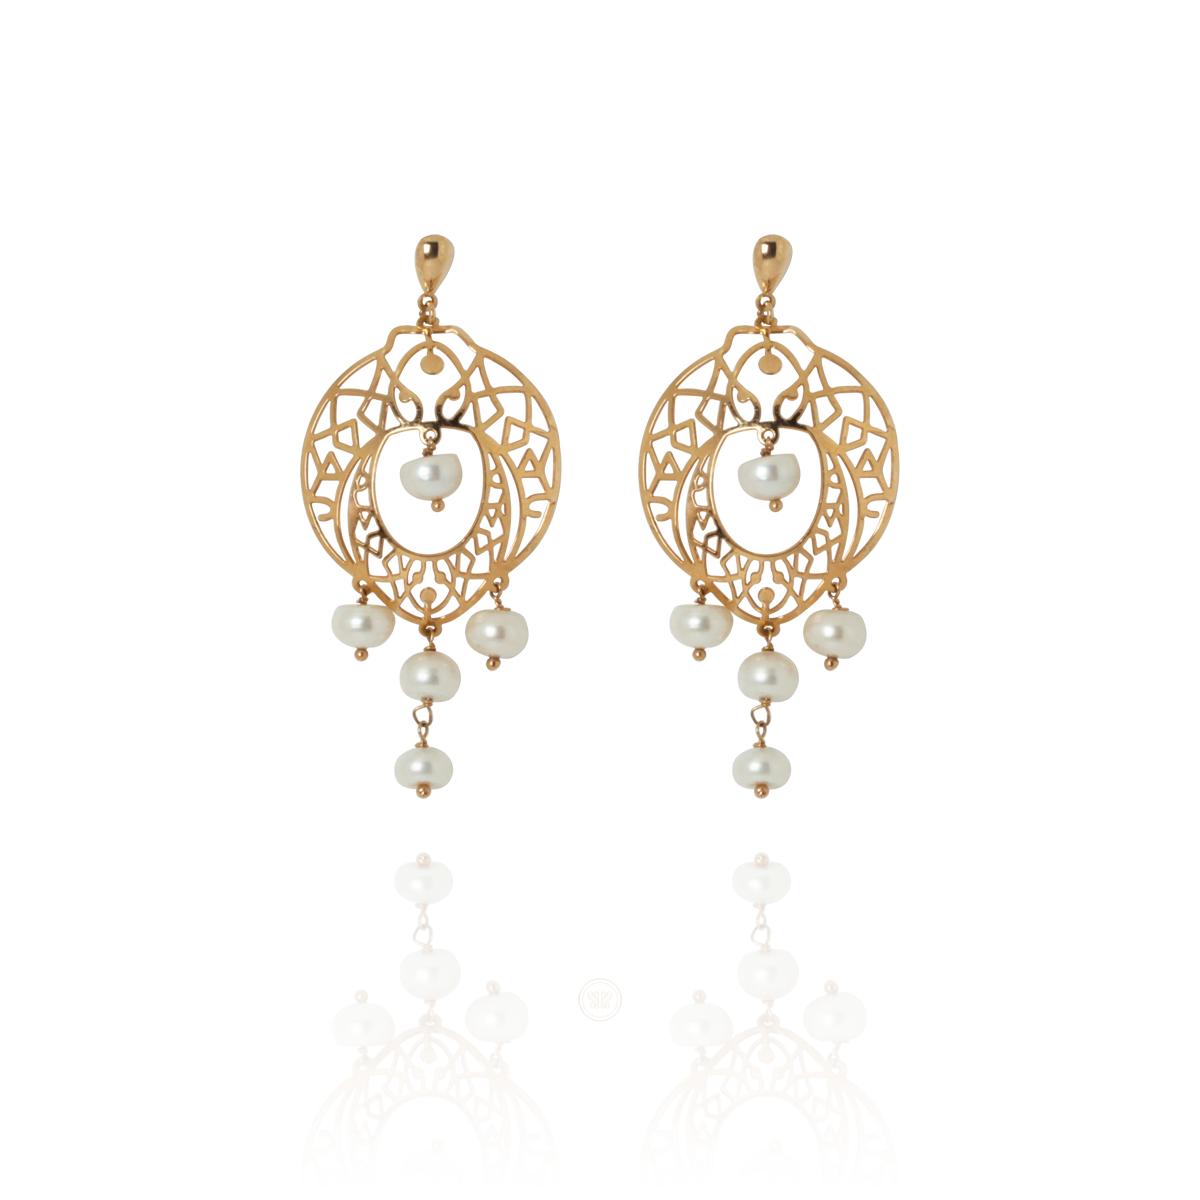 Brinco Barbara Strauss Semi Joia Durban De Pérola Lalique, Rev. Em Ouro 18K